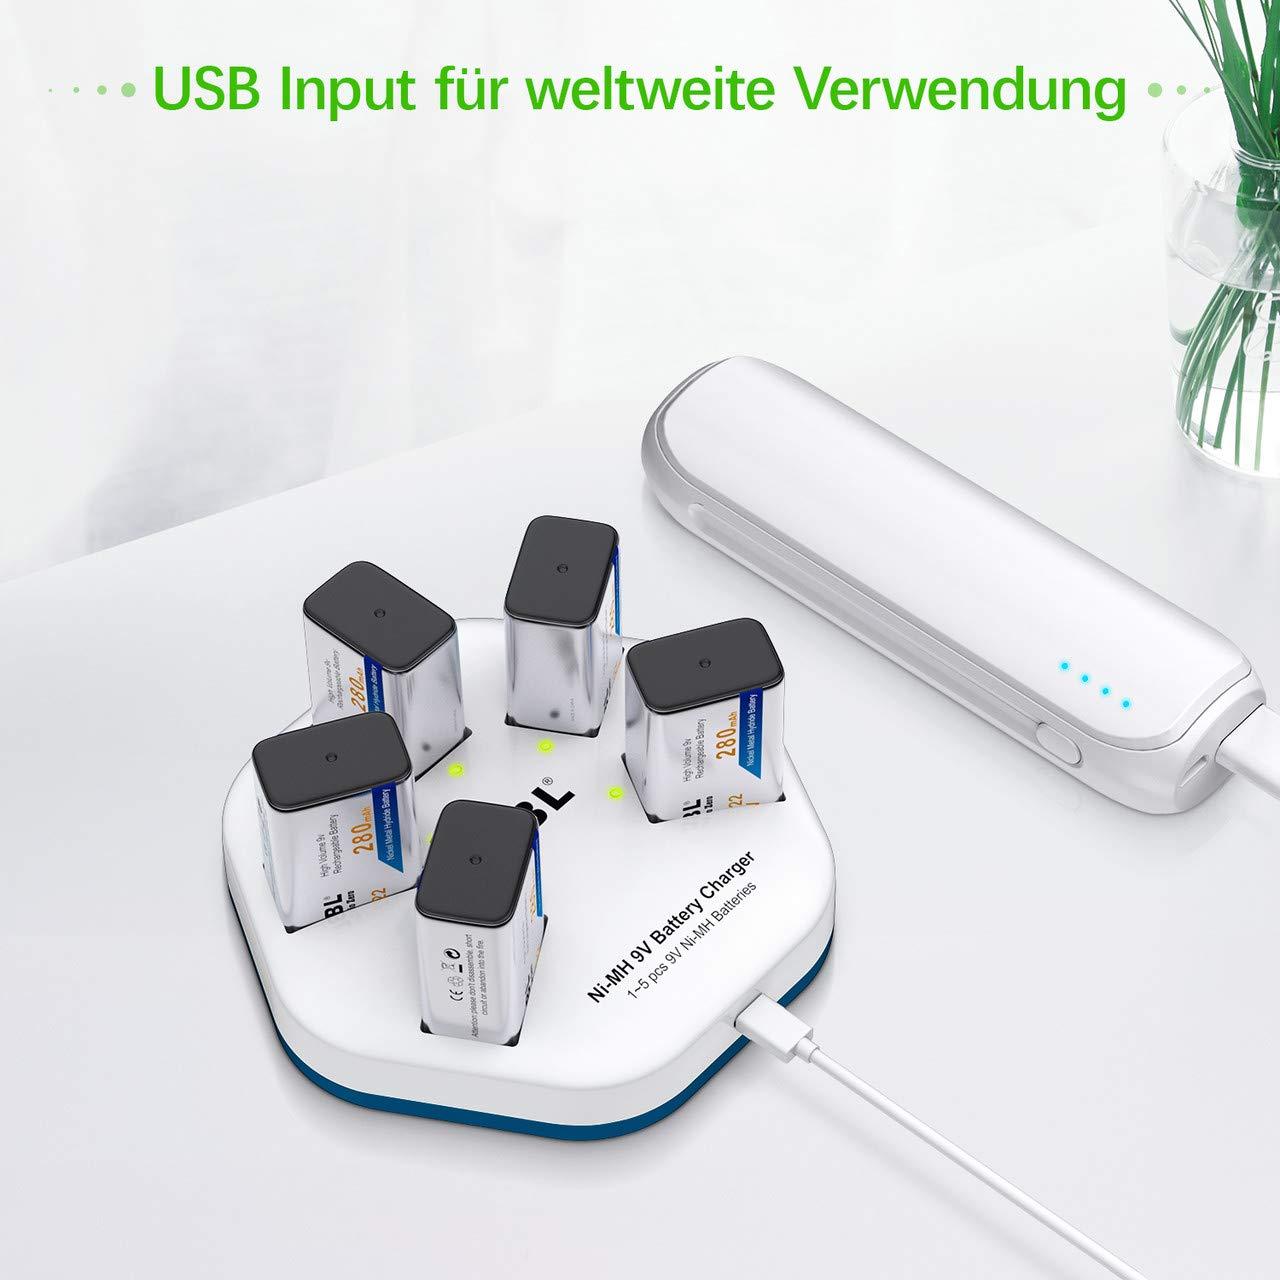 EBL USB Ladegerät 9V Akku Ladegerät mit 5 Stück 9V Block NI-MH Akkus 280mAh